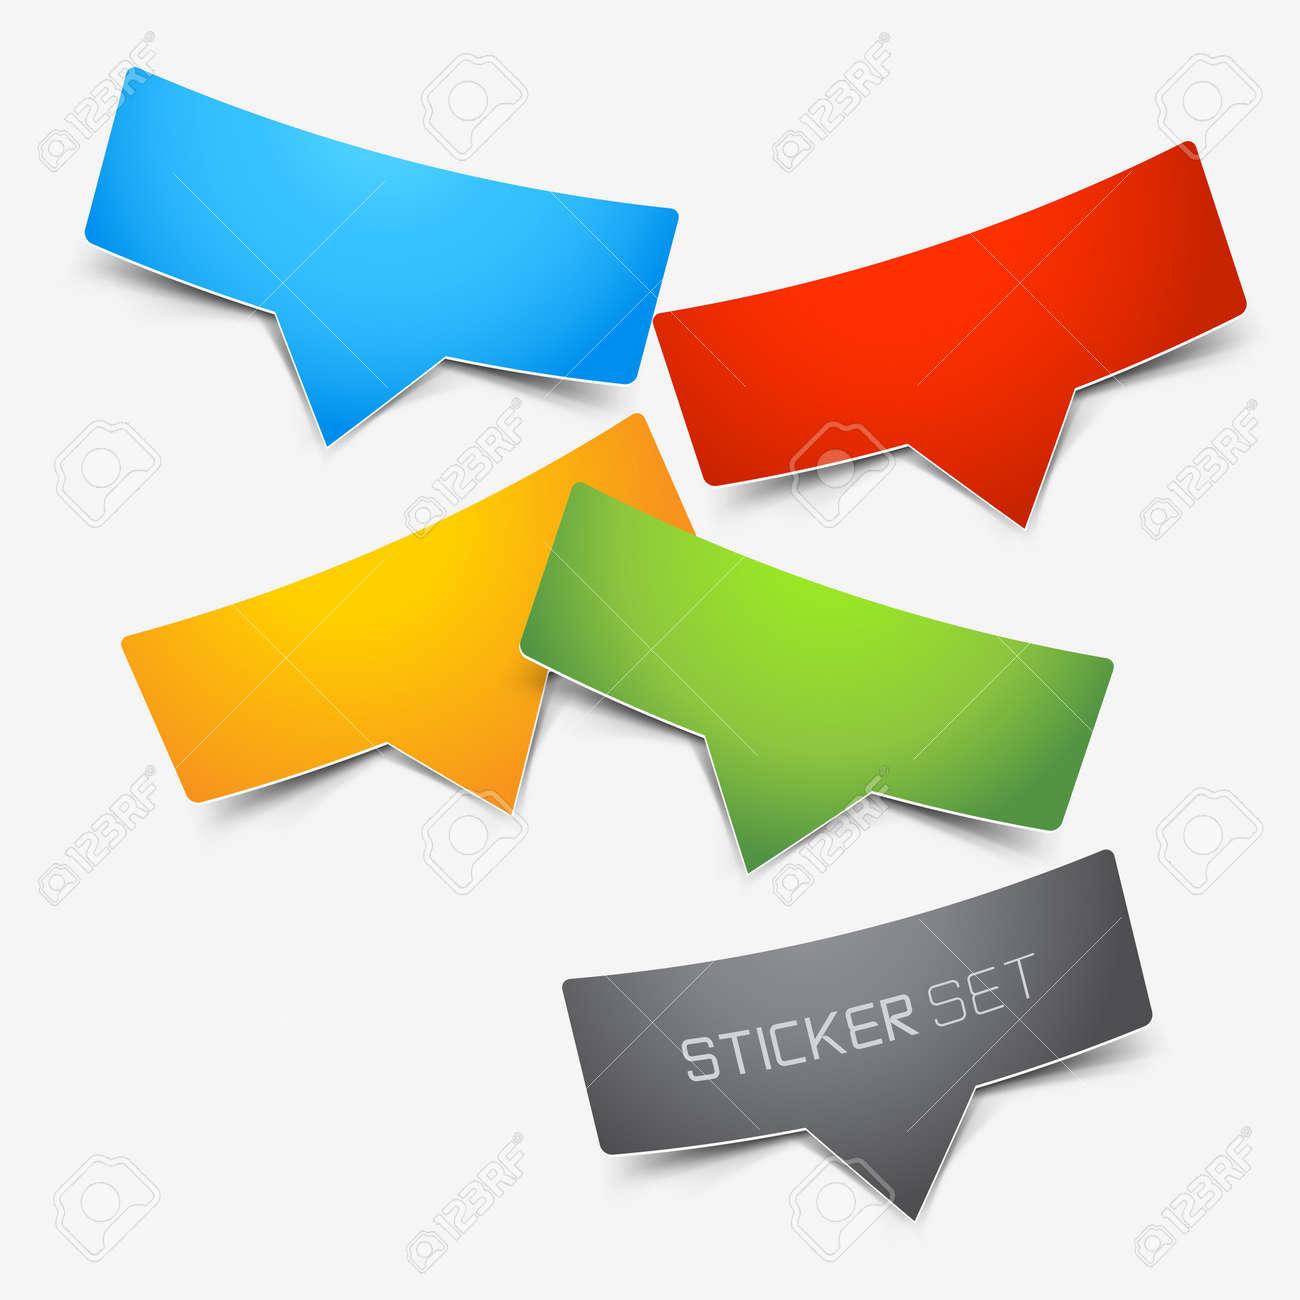 Colourful Sticker Set Stock Vector - 16462277